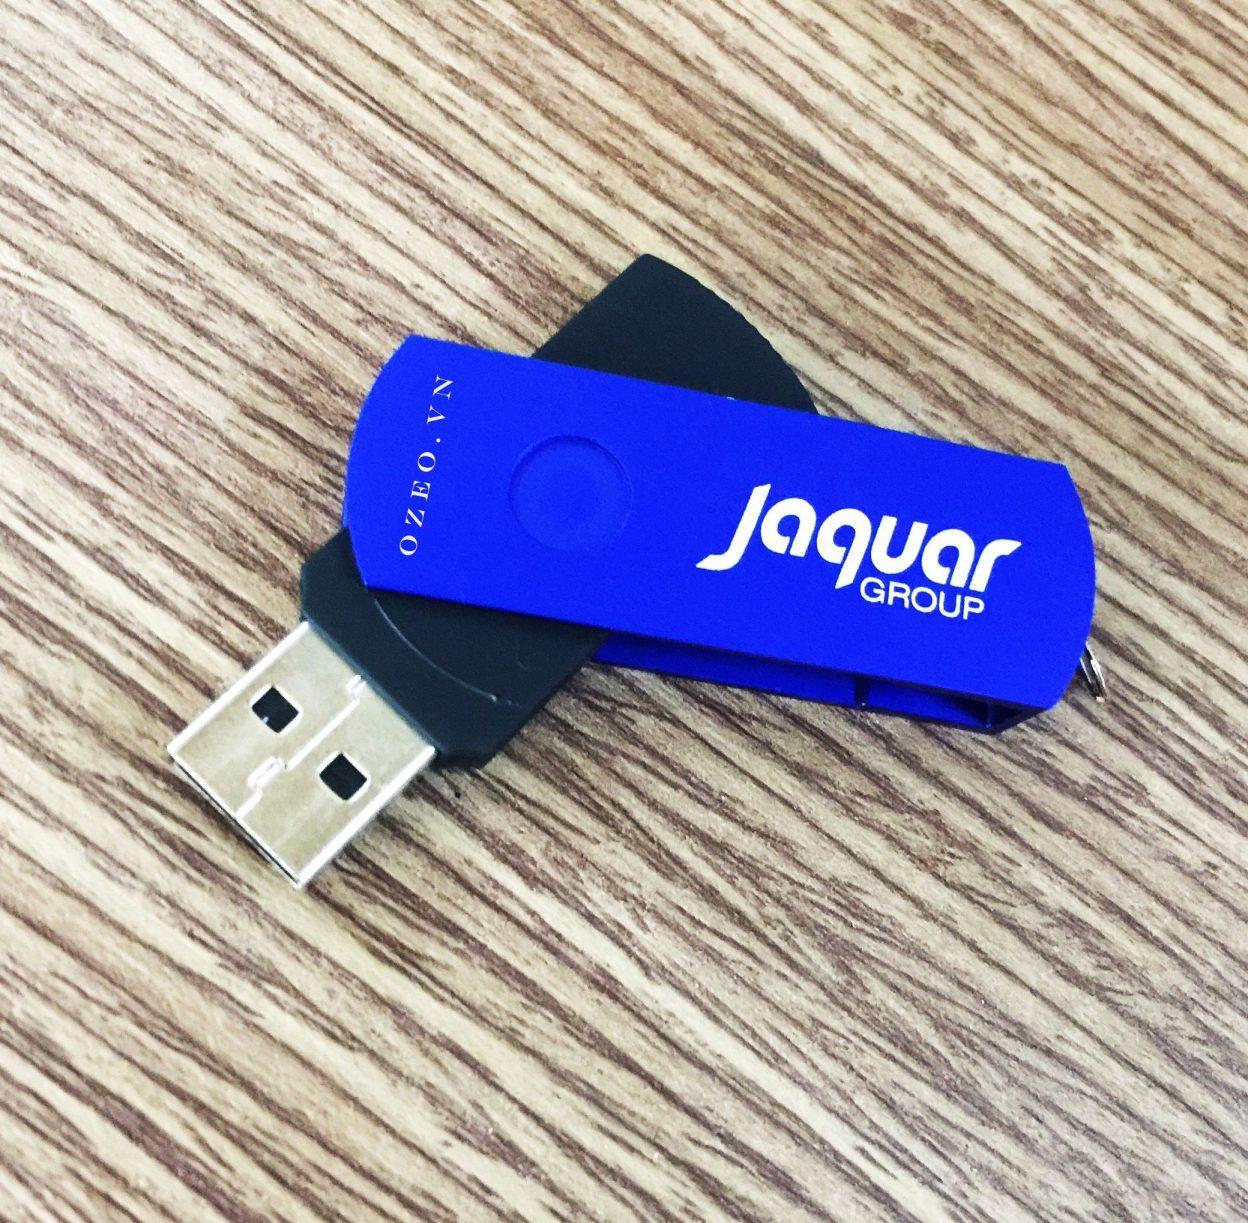 USB kim loại quà tặng khắc Jaquar Group